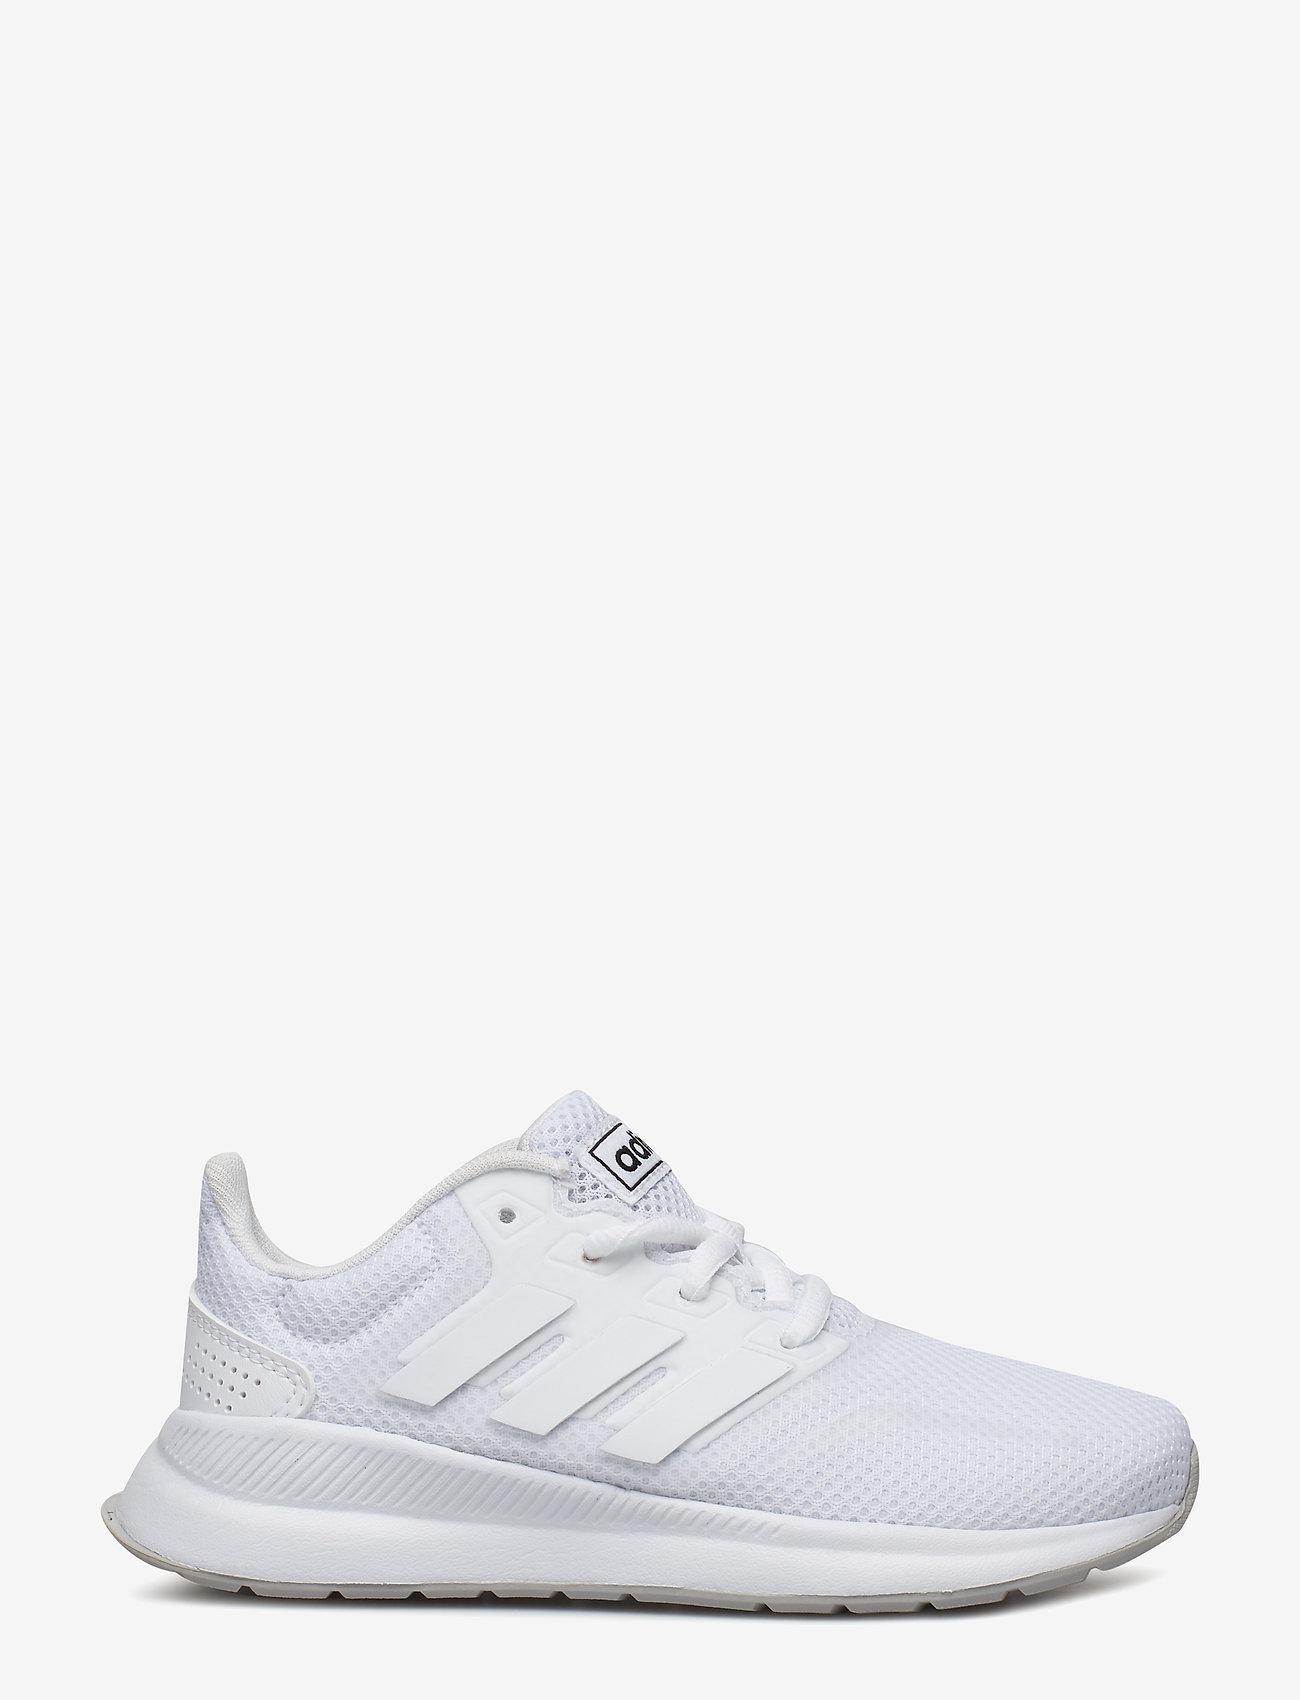 adidas Performance - RUNFALCON K - training shoes - ftwwht/ftwwht/gretwo - 1